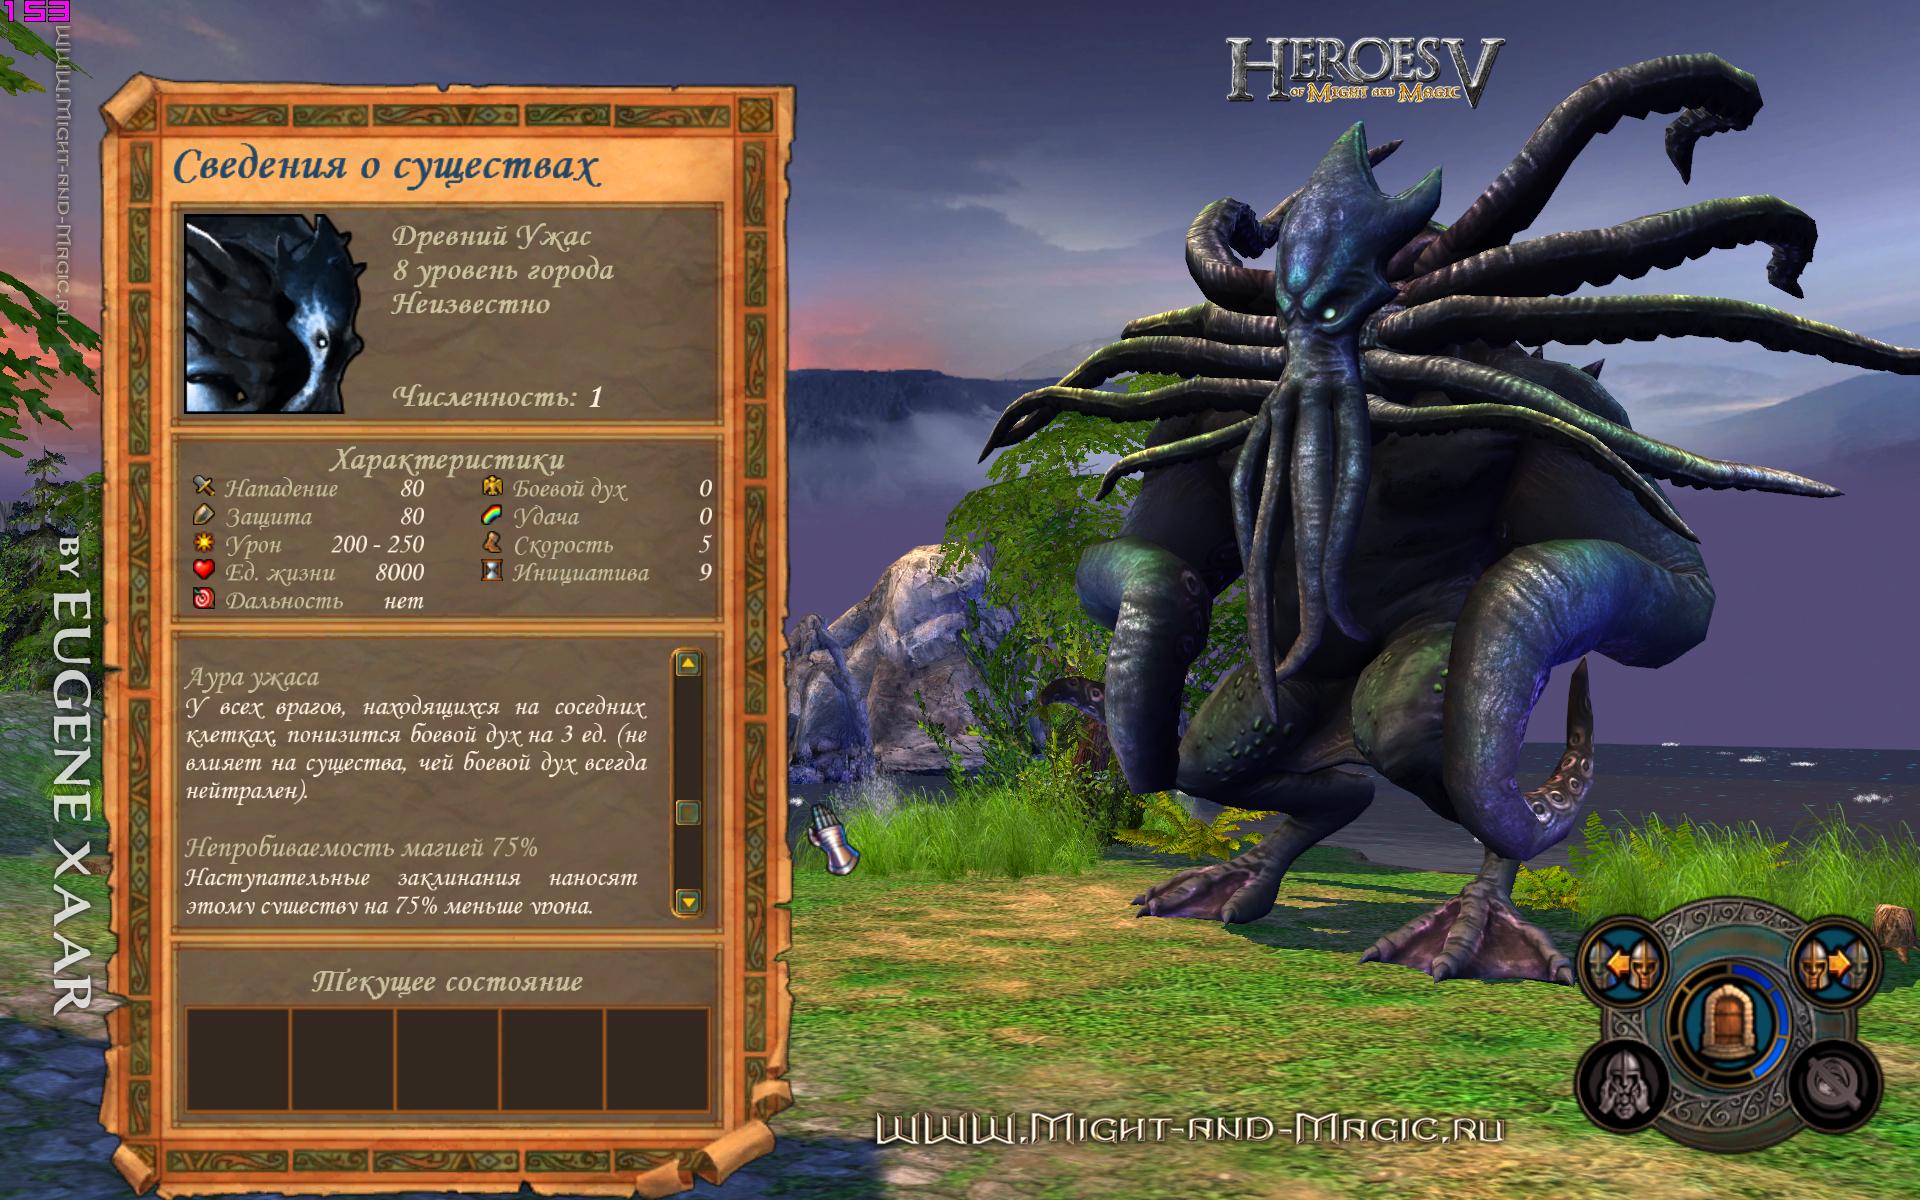 Heroes V(5) Sea Neutral. Древний ужас. Аура ужаса